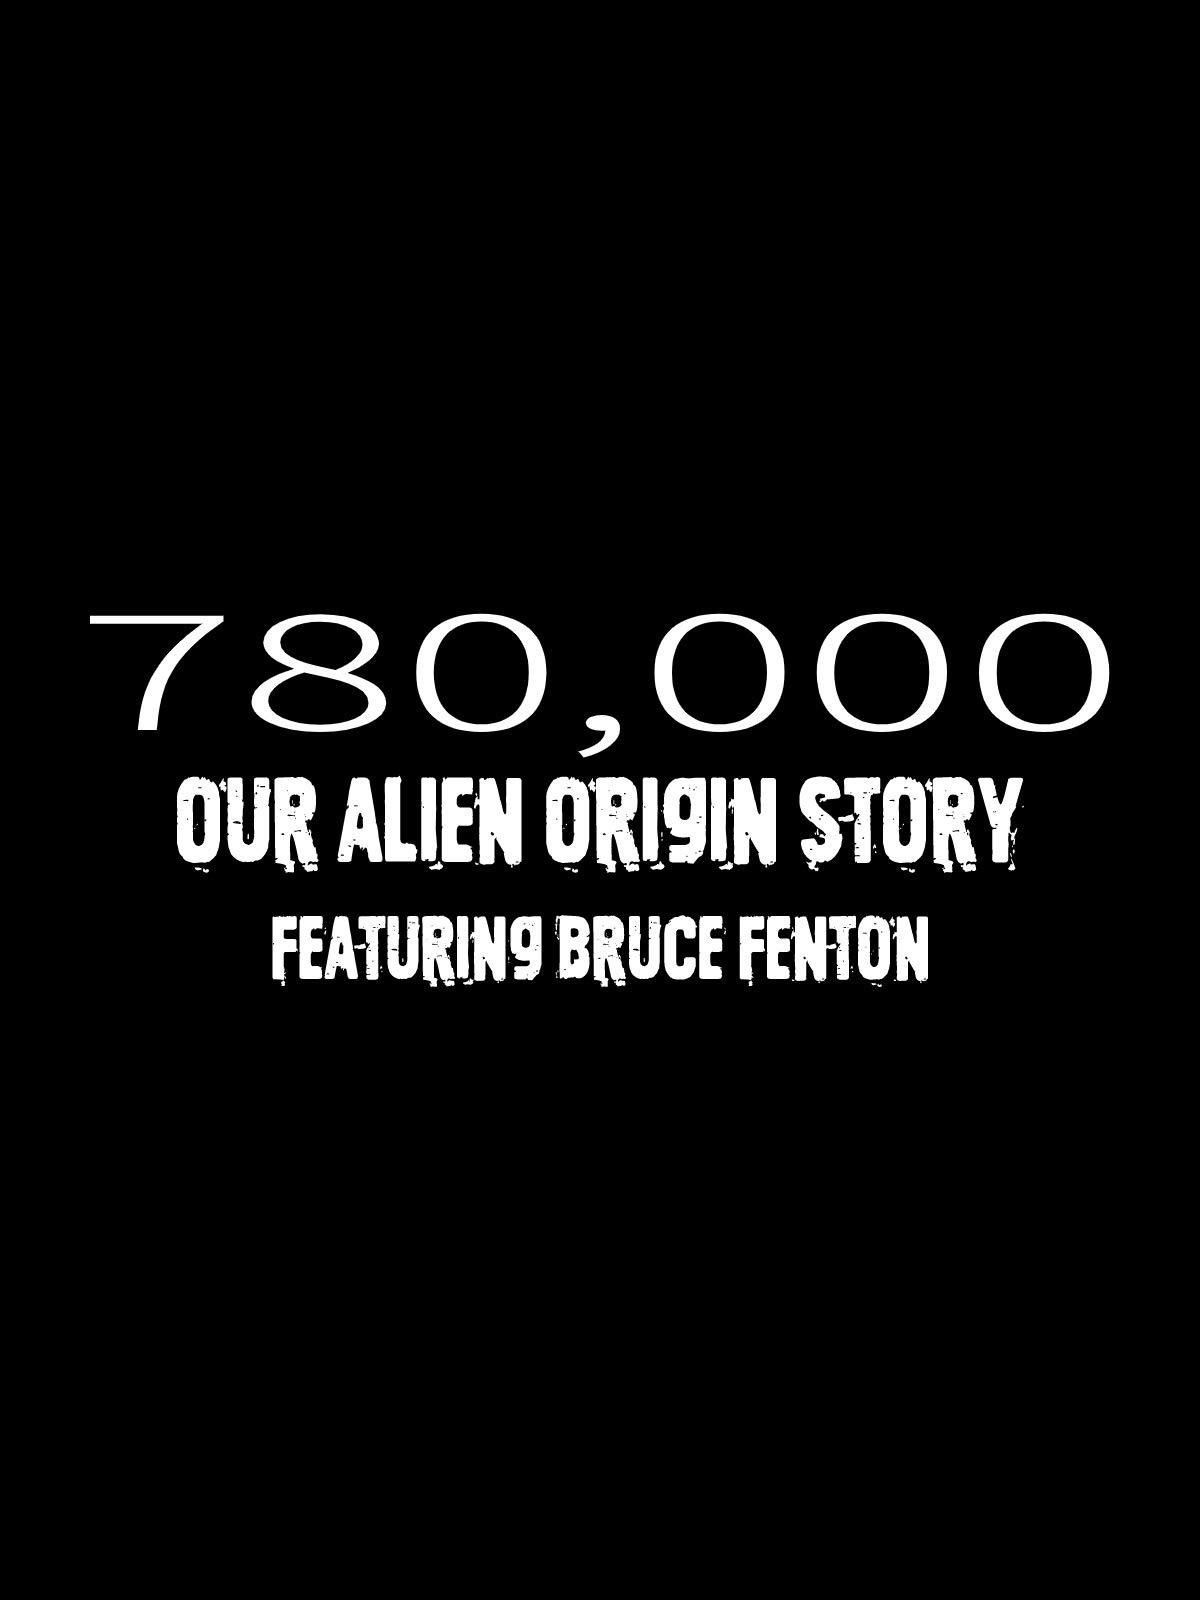 780,000: Our Alien Origin Story, Featuring Bruce Fenton